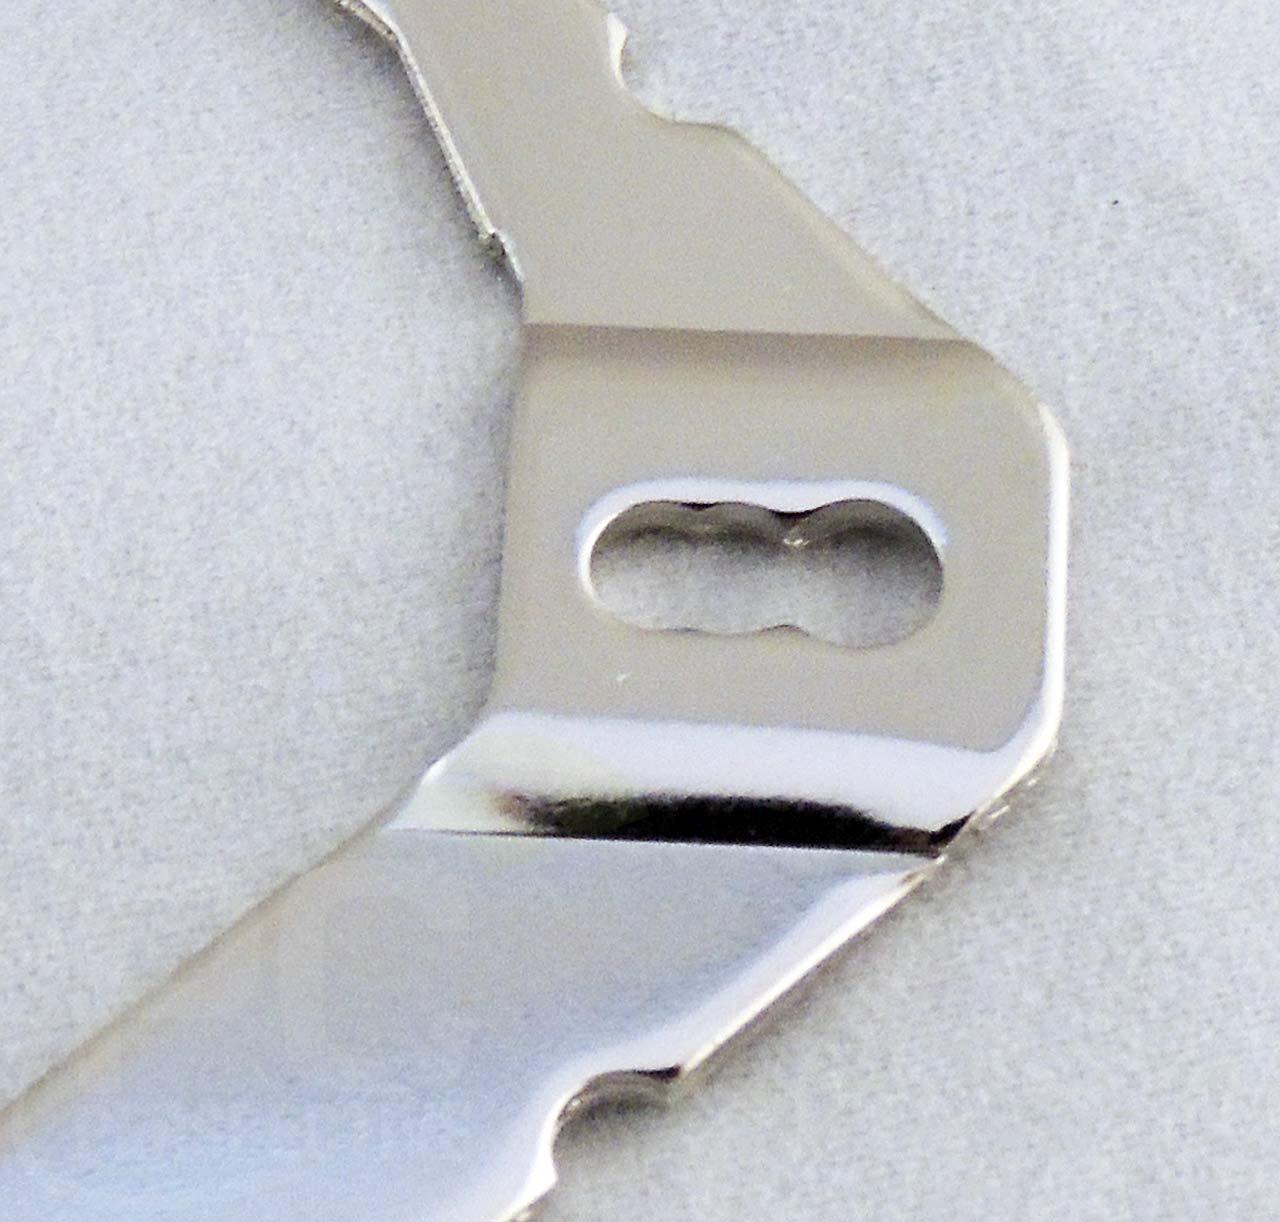 10-mount-topbracket-closeup.jpg